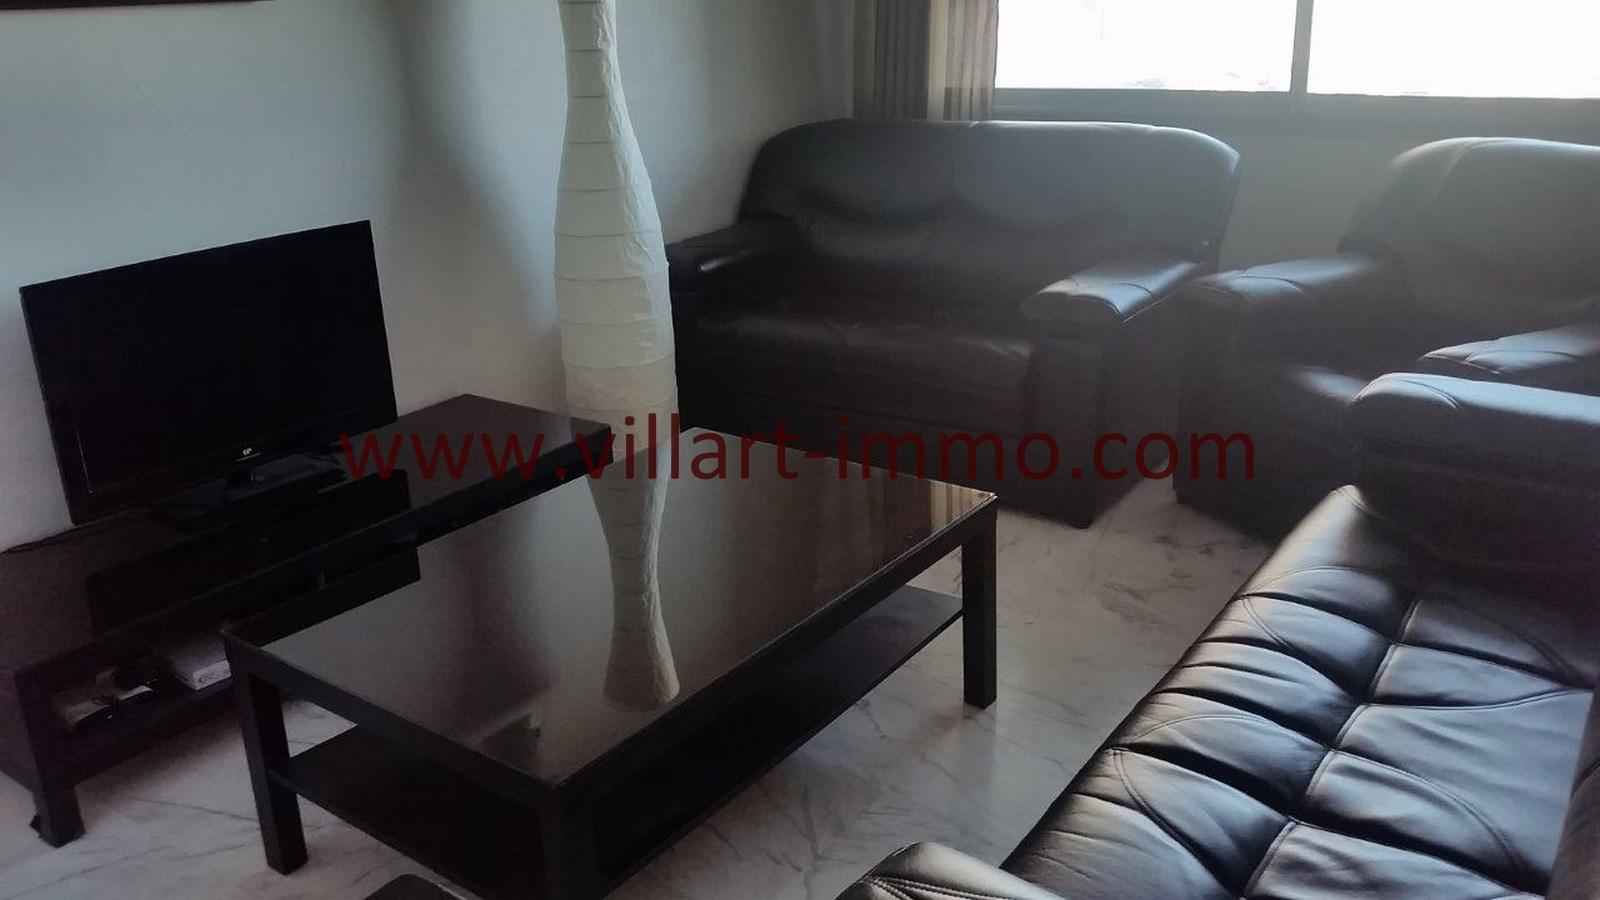 2-Vente-Appartement-Tanger-Centre-De-Ville-Salon 2-VA576-Villart Immo